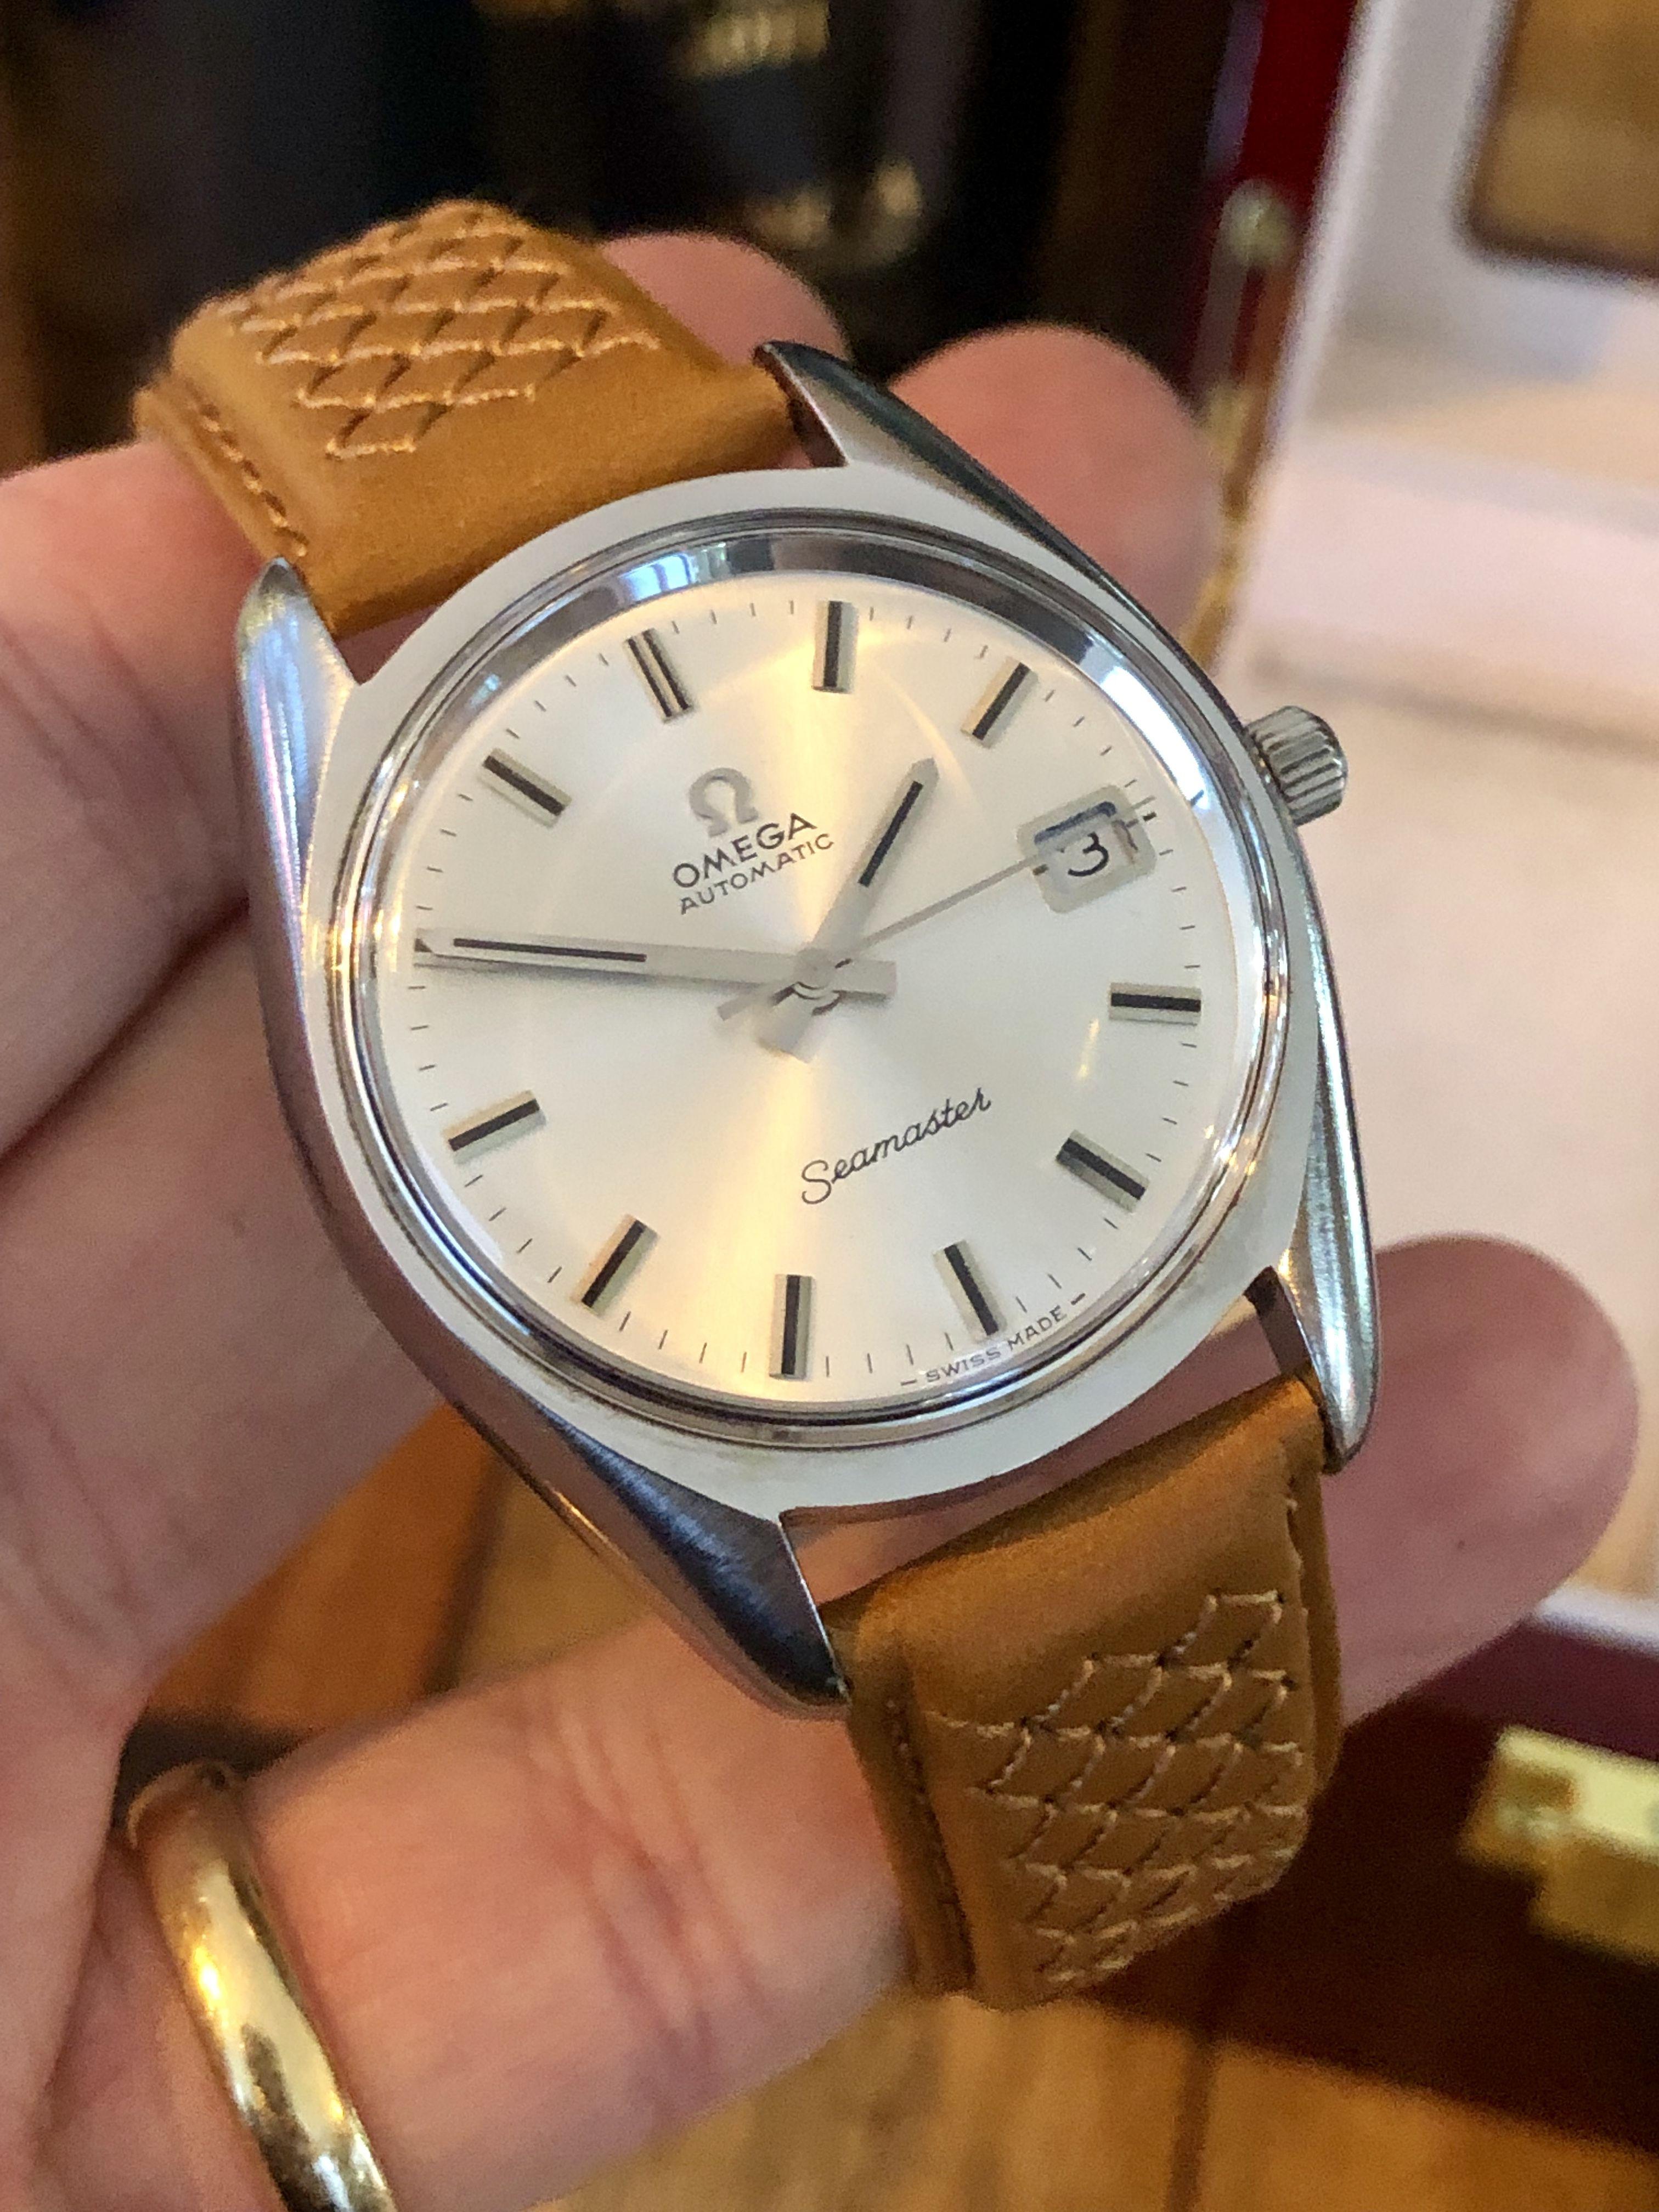 Stunning & Rare Omega Seamaster vintage 1969 men's watch #luxurywatches